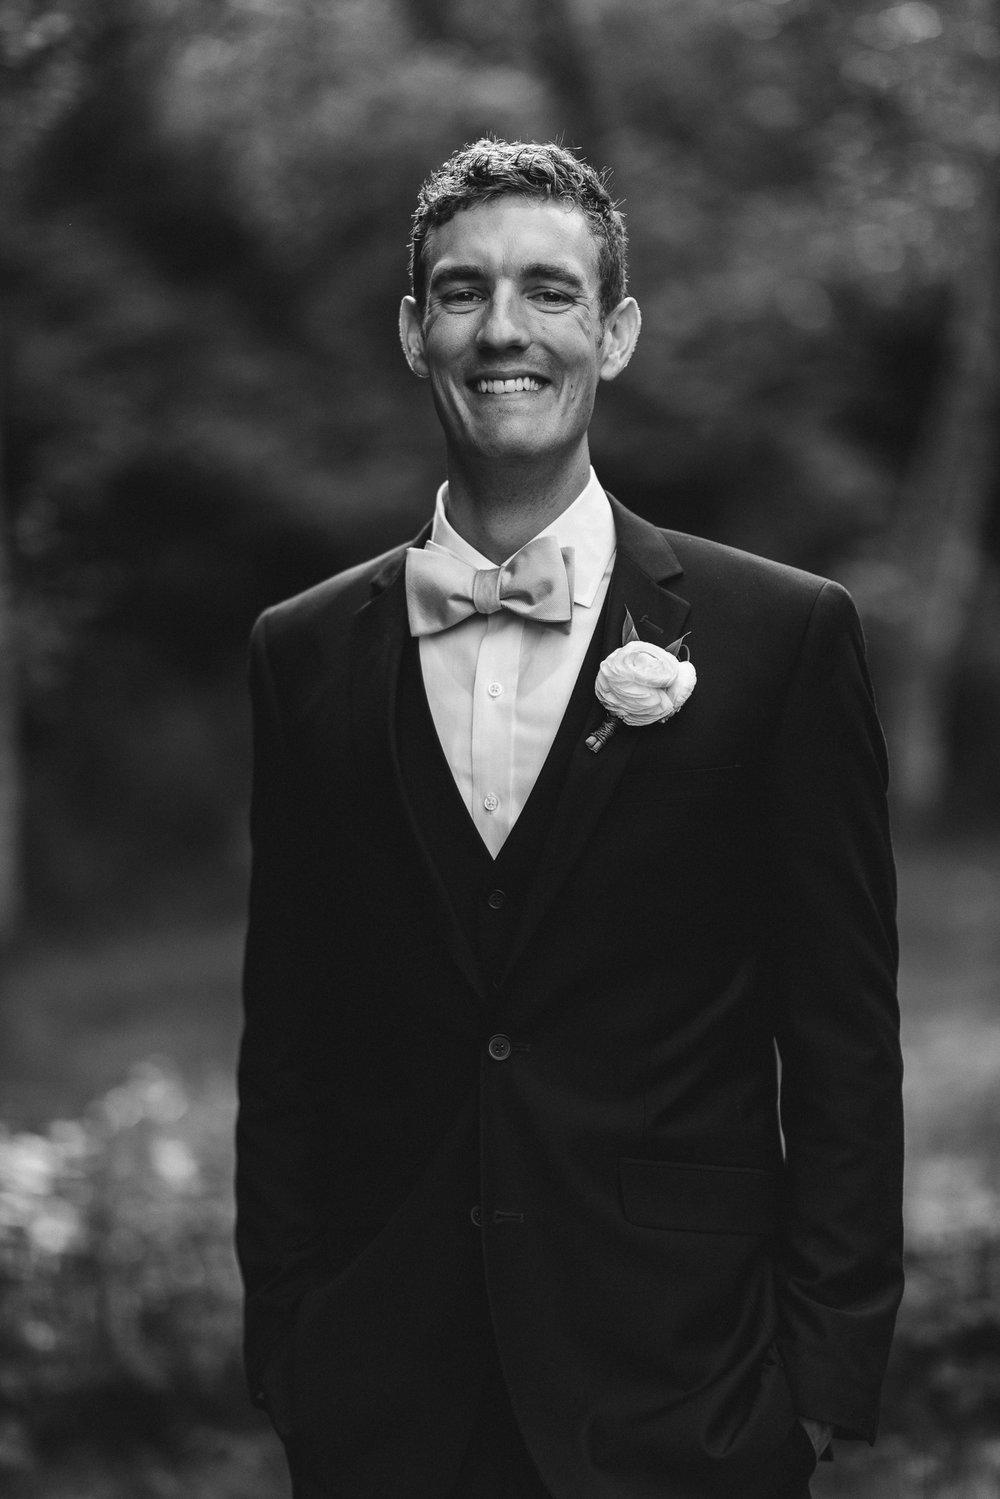 BEST_CHICAG_WEDDING_PHOTOGRAPHER_ZOE_RAIN_-75.jpg